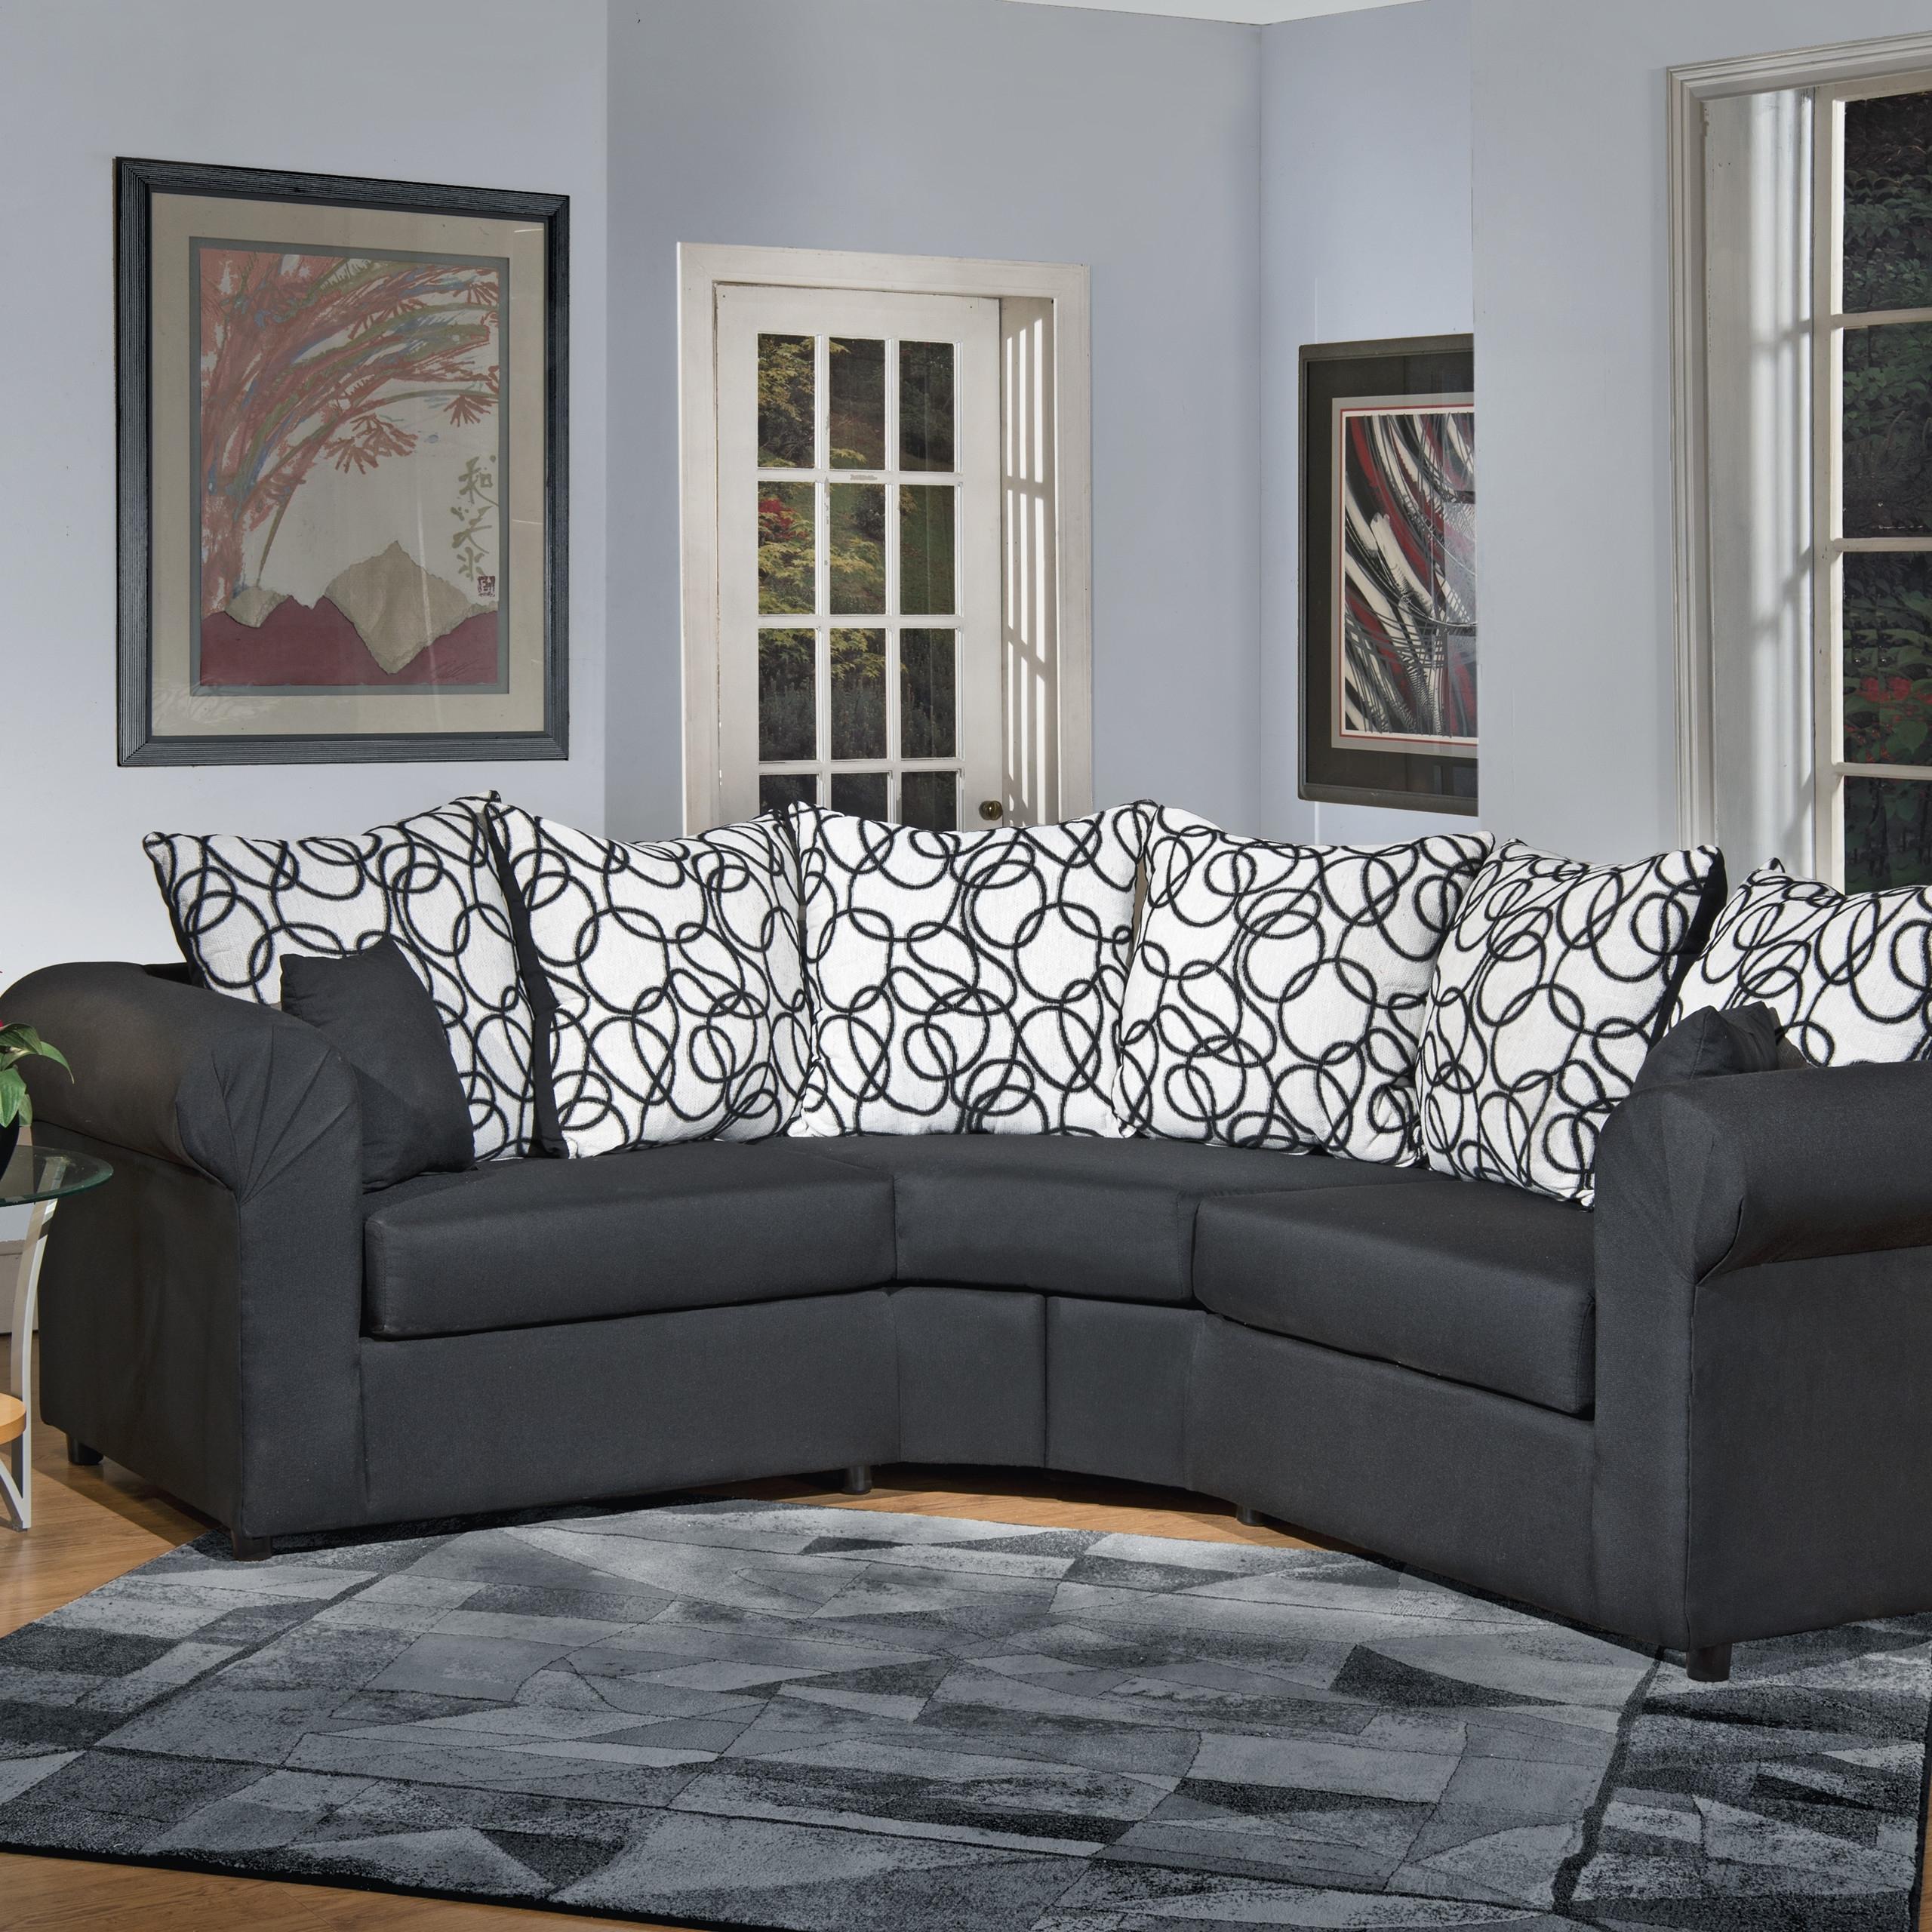 Wayfair Sofas – Mforum With Regard To Wayfair Sectional Sofas (View 9 of 10)